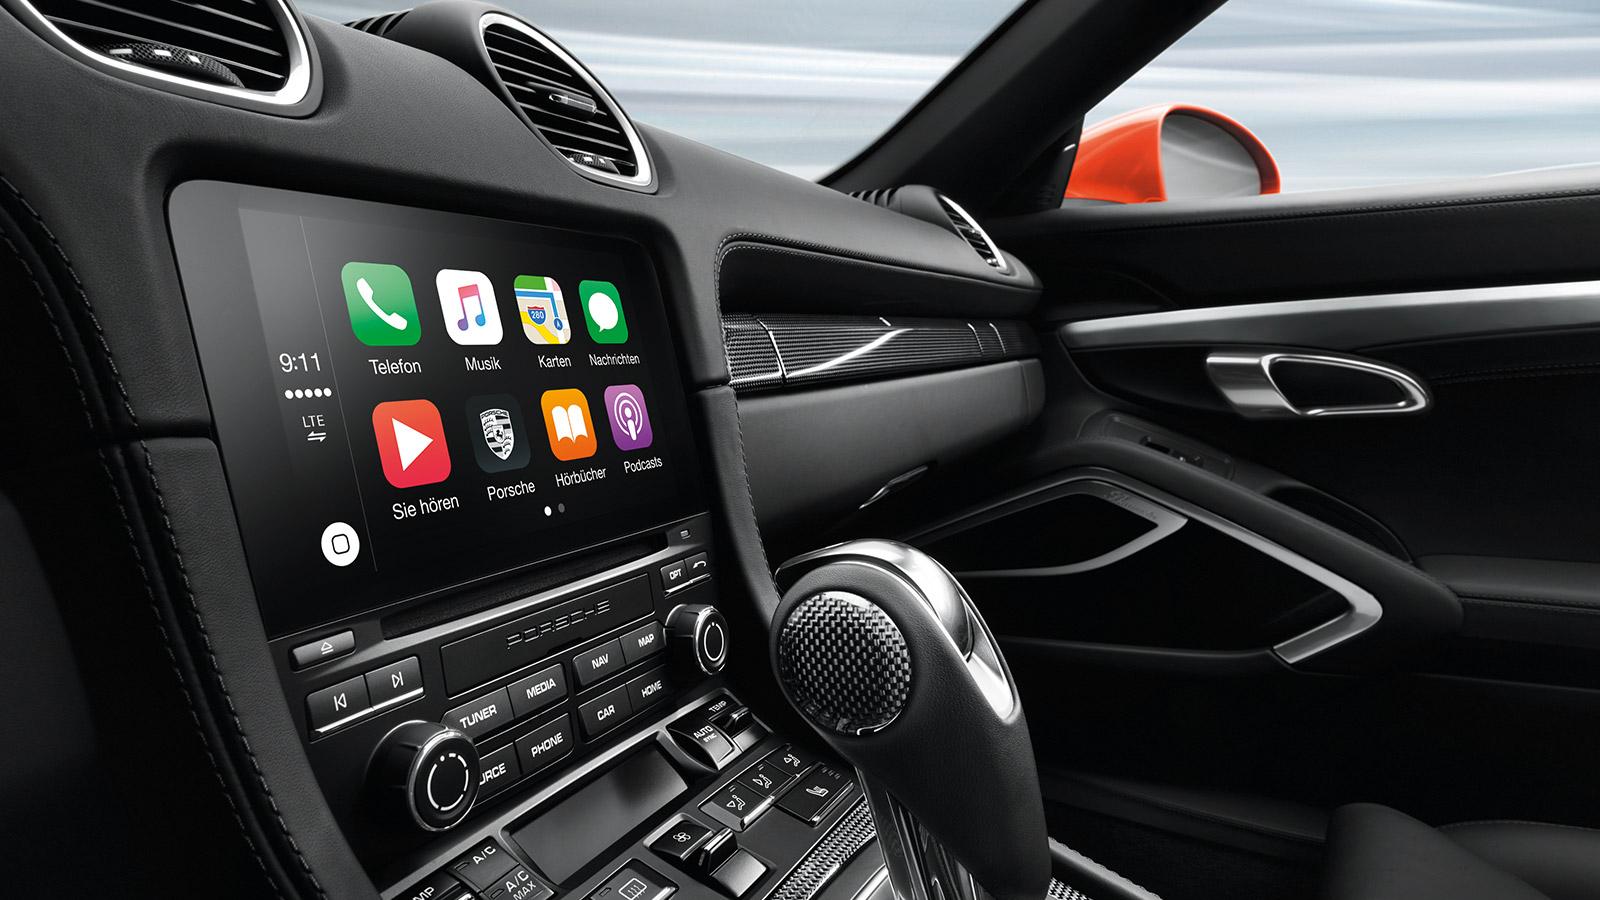 Porsche - Навигация и коммуникация